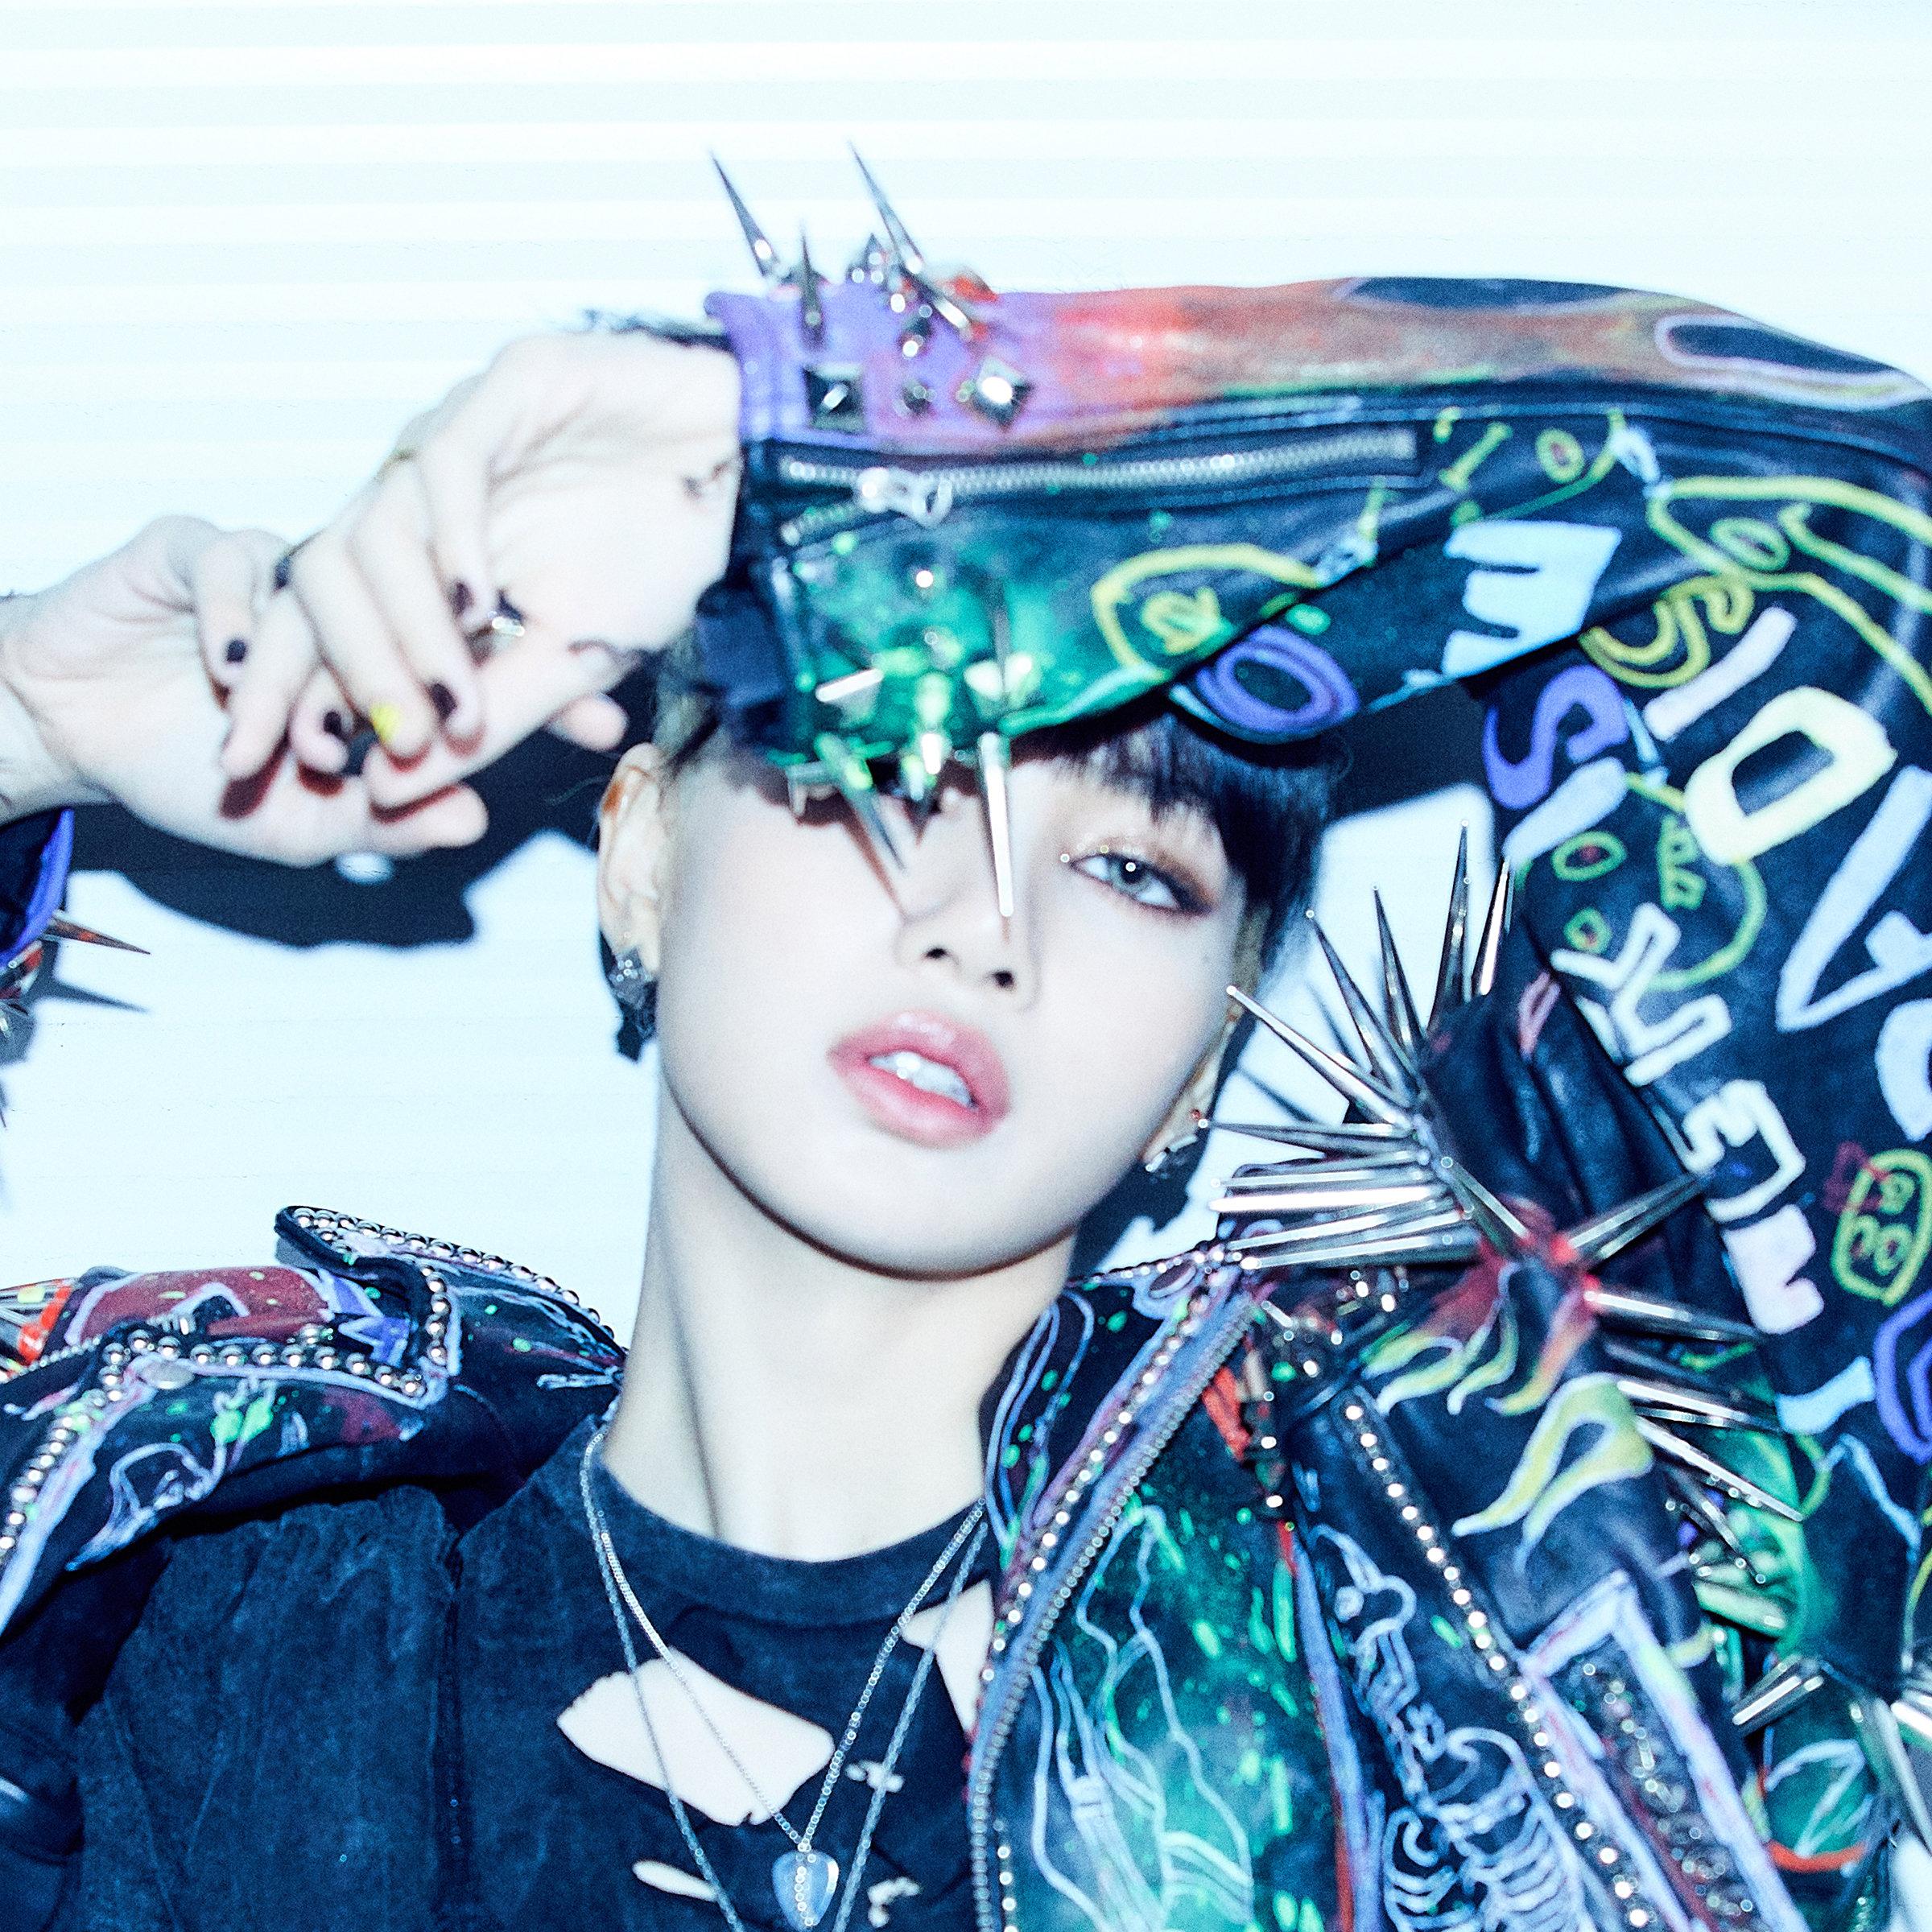 blackpink the Album concept lisa